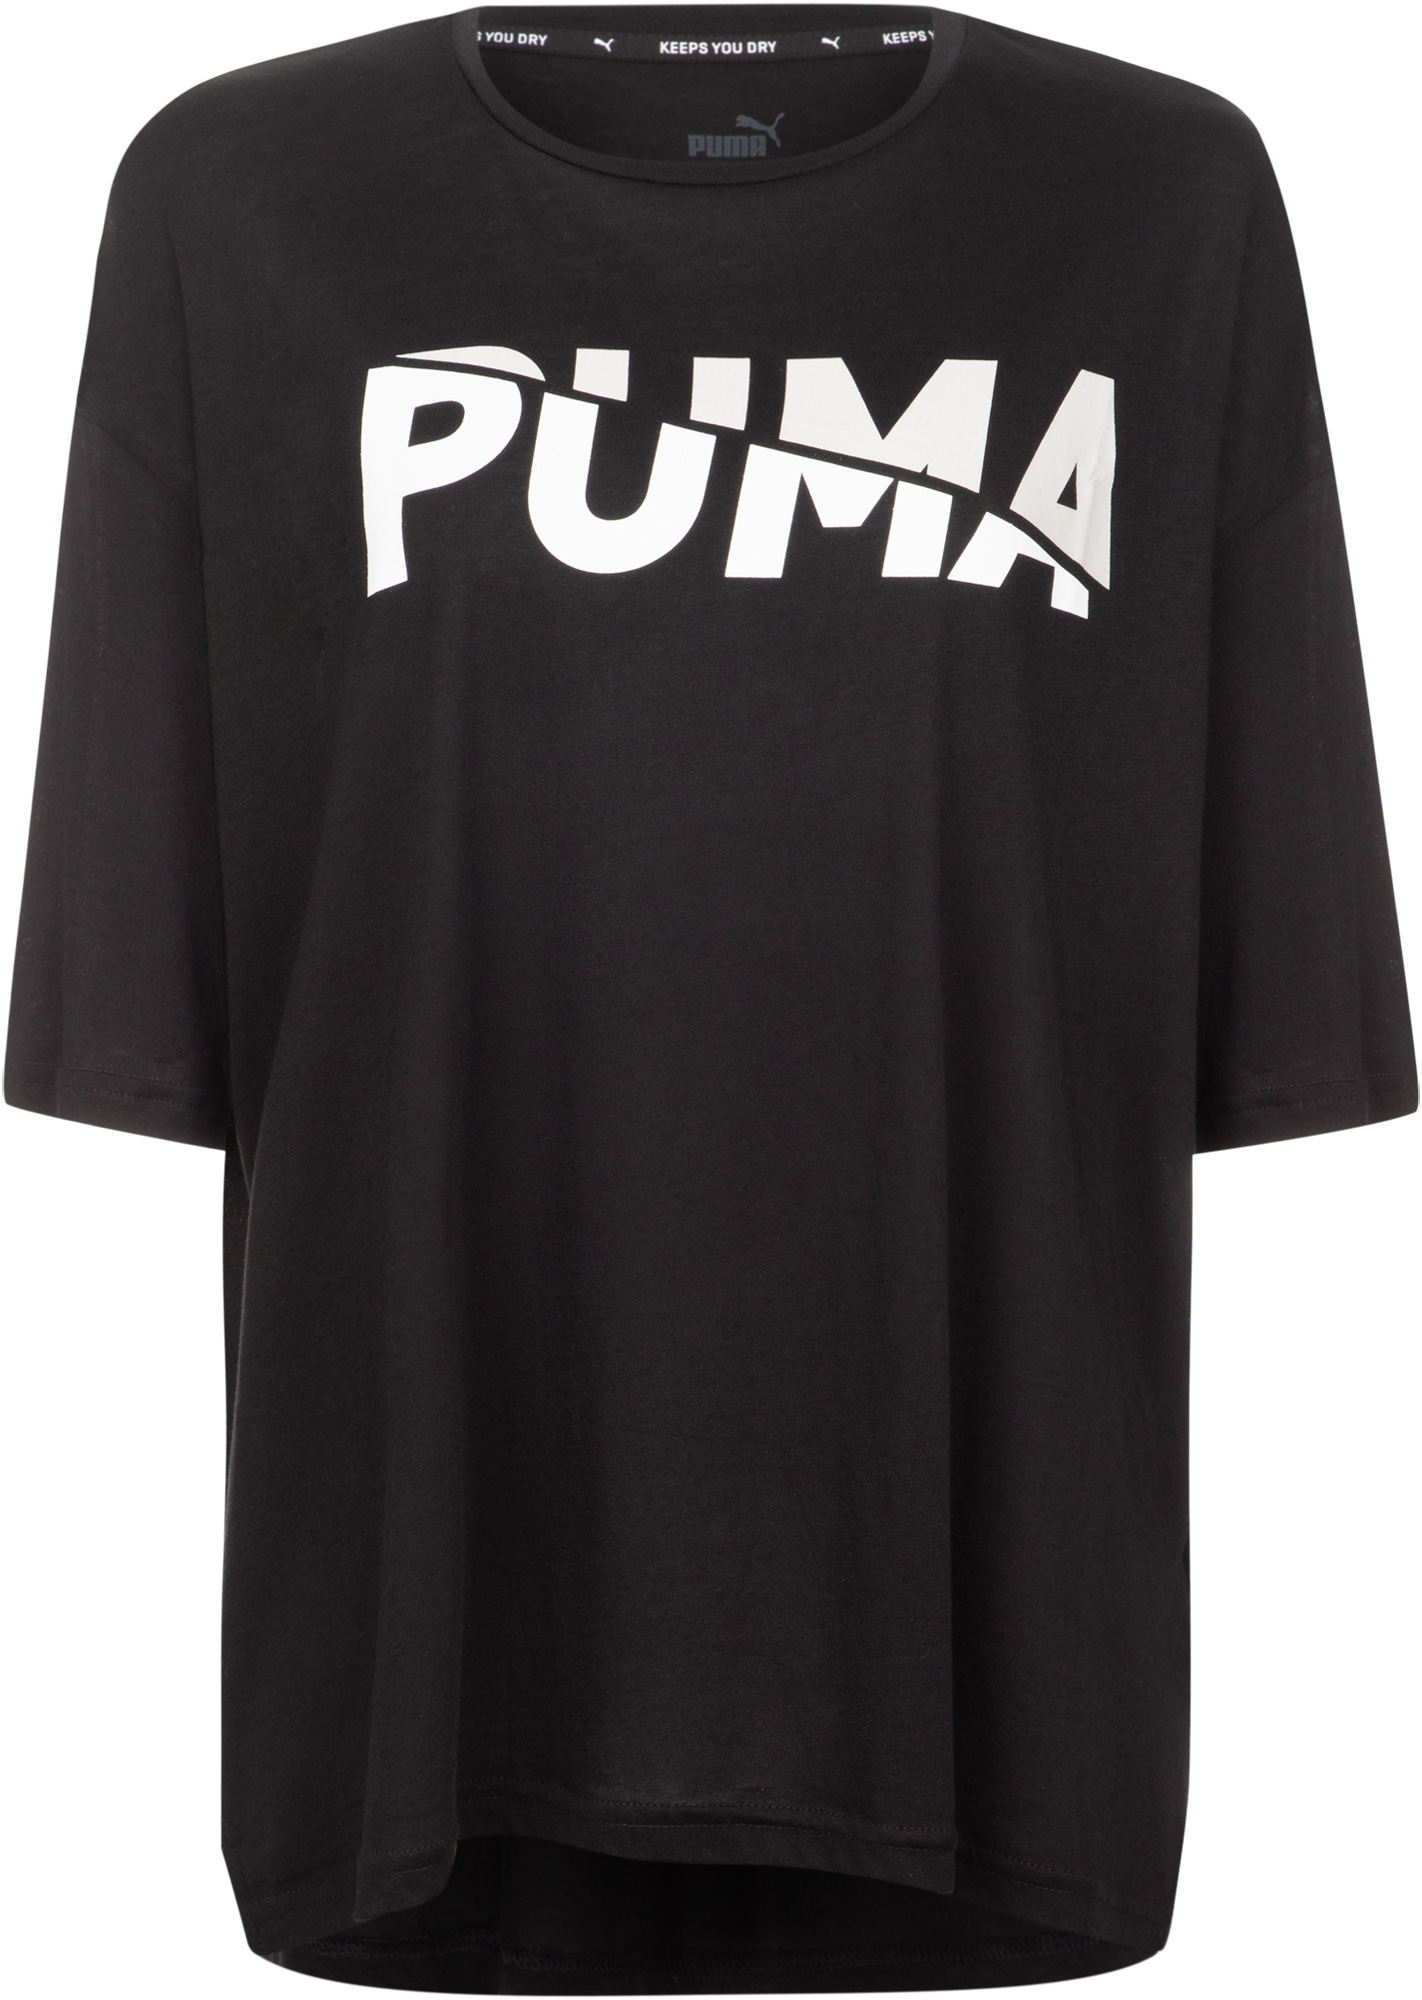 Puma Футболка женская Puma Modern Sports Fashion Tee, размер 46-48 майка женская puma mesh it up layer tank цвет черный 51641701 размер xxl 50 52